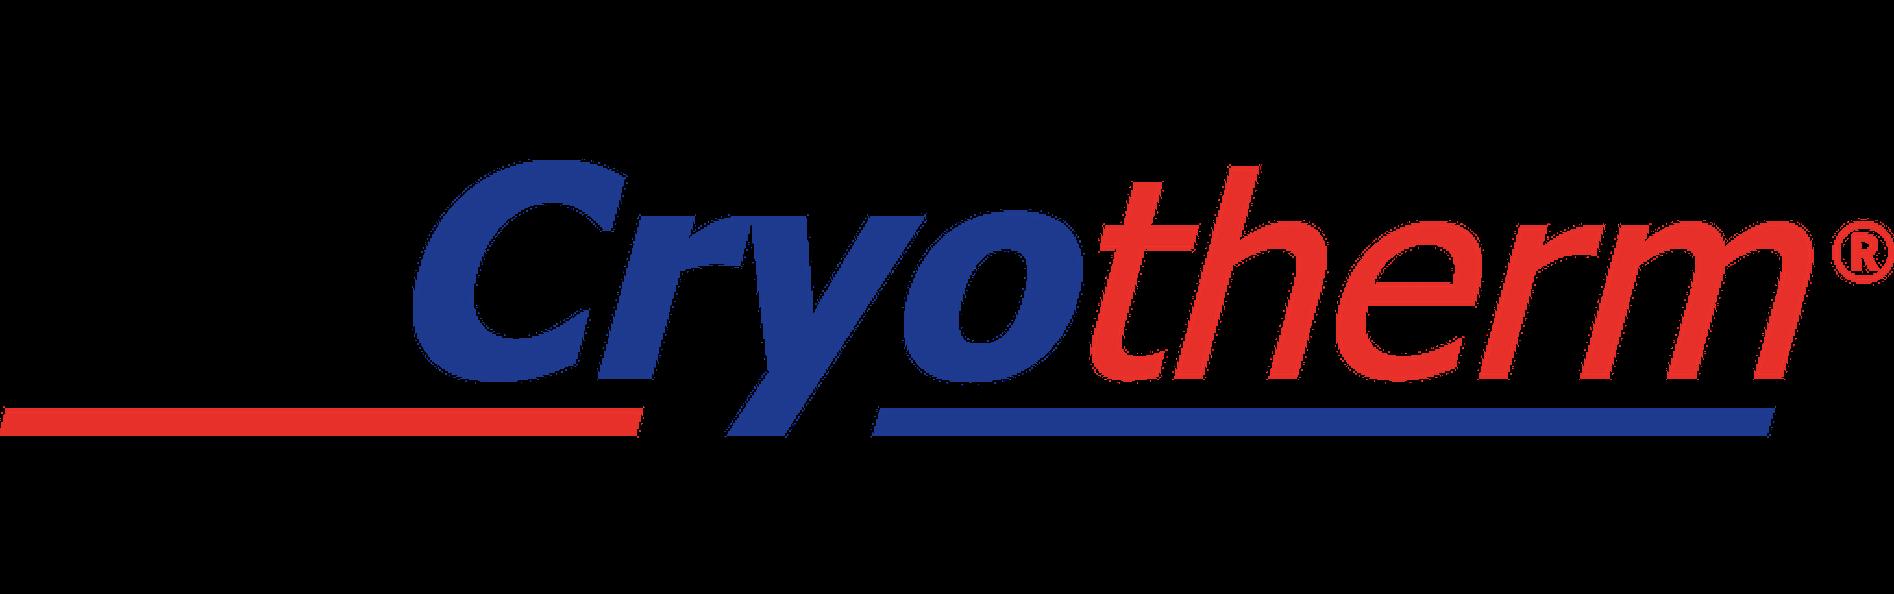 Cryotherm_Logo_Biobank_BioTech_Pharma_Summit_3